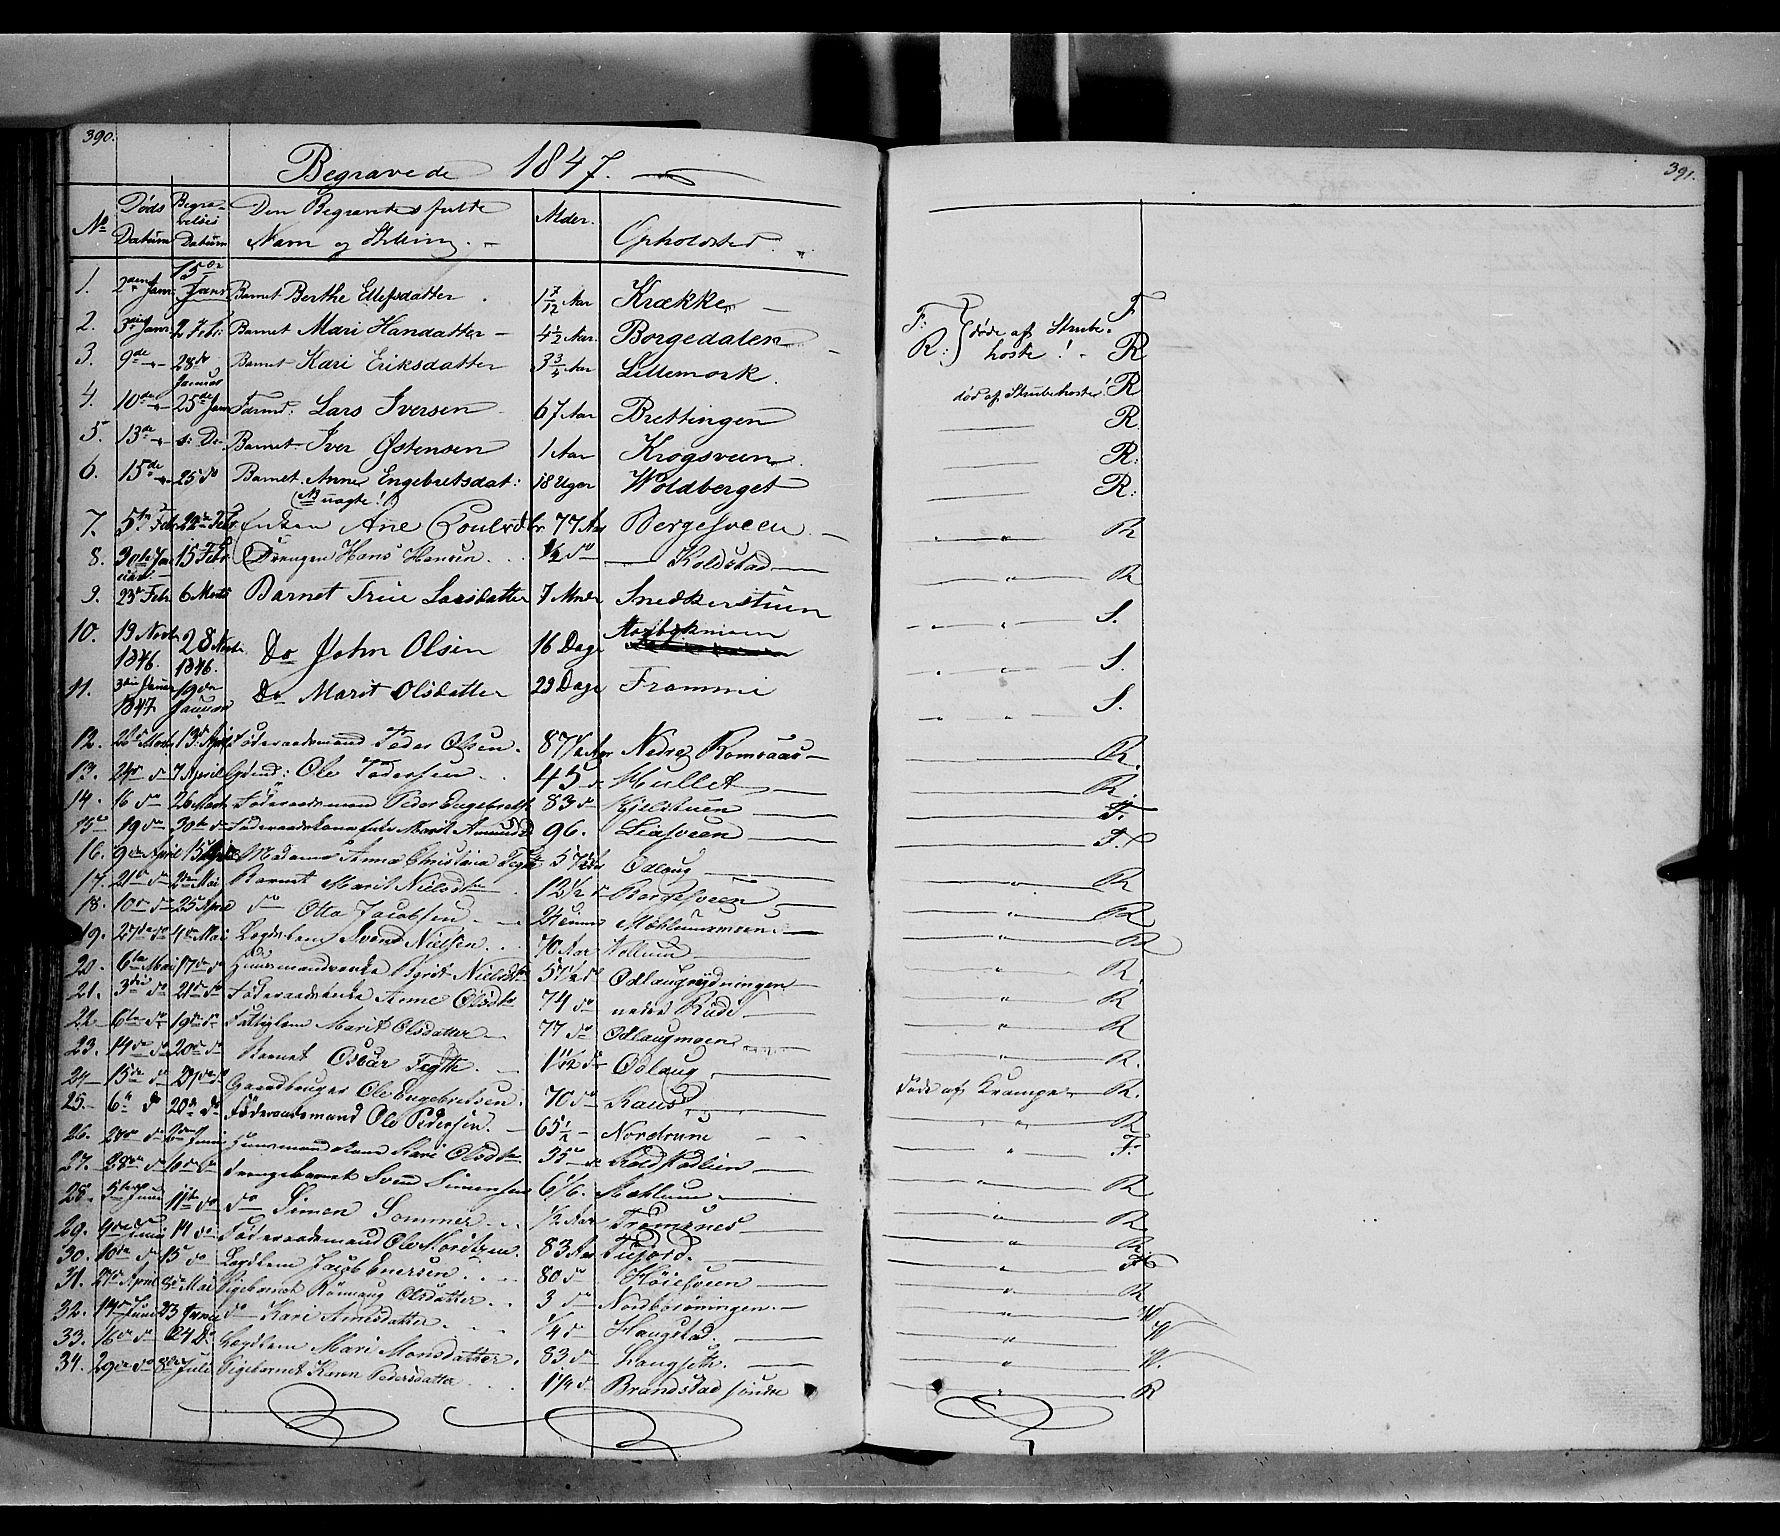 SAH, Ringebu prestekontor, Ministerialbok nr. 5, 1839-1848, s. 390-391